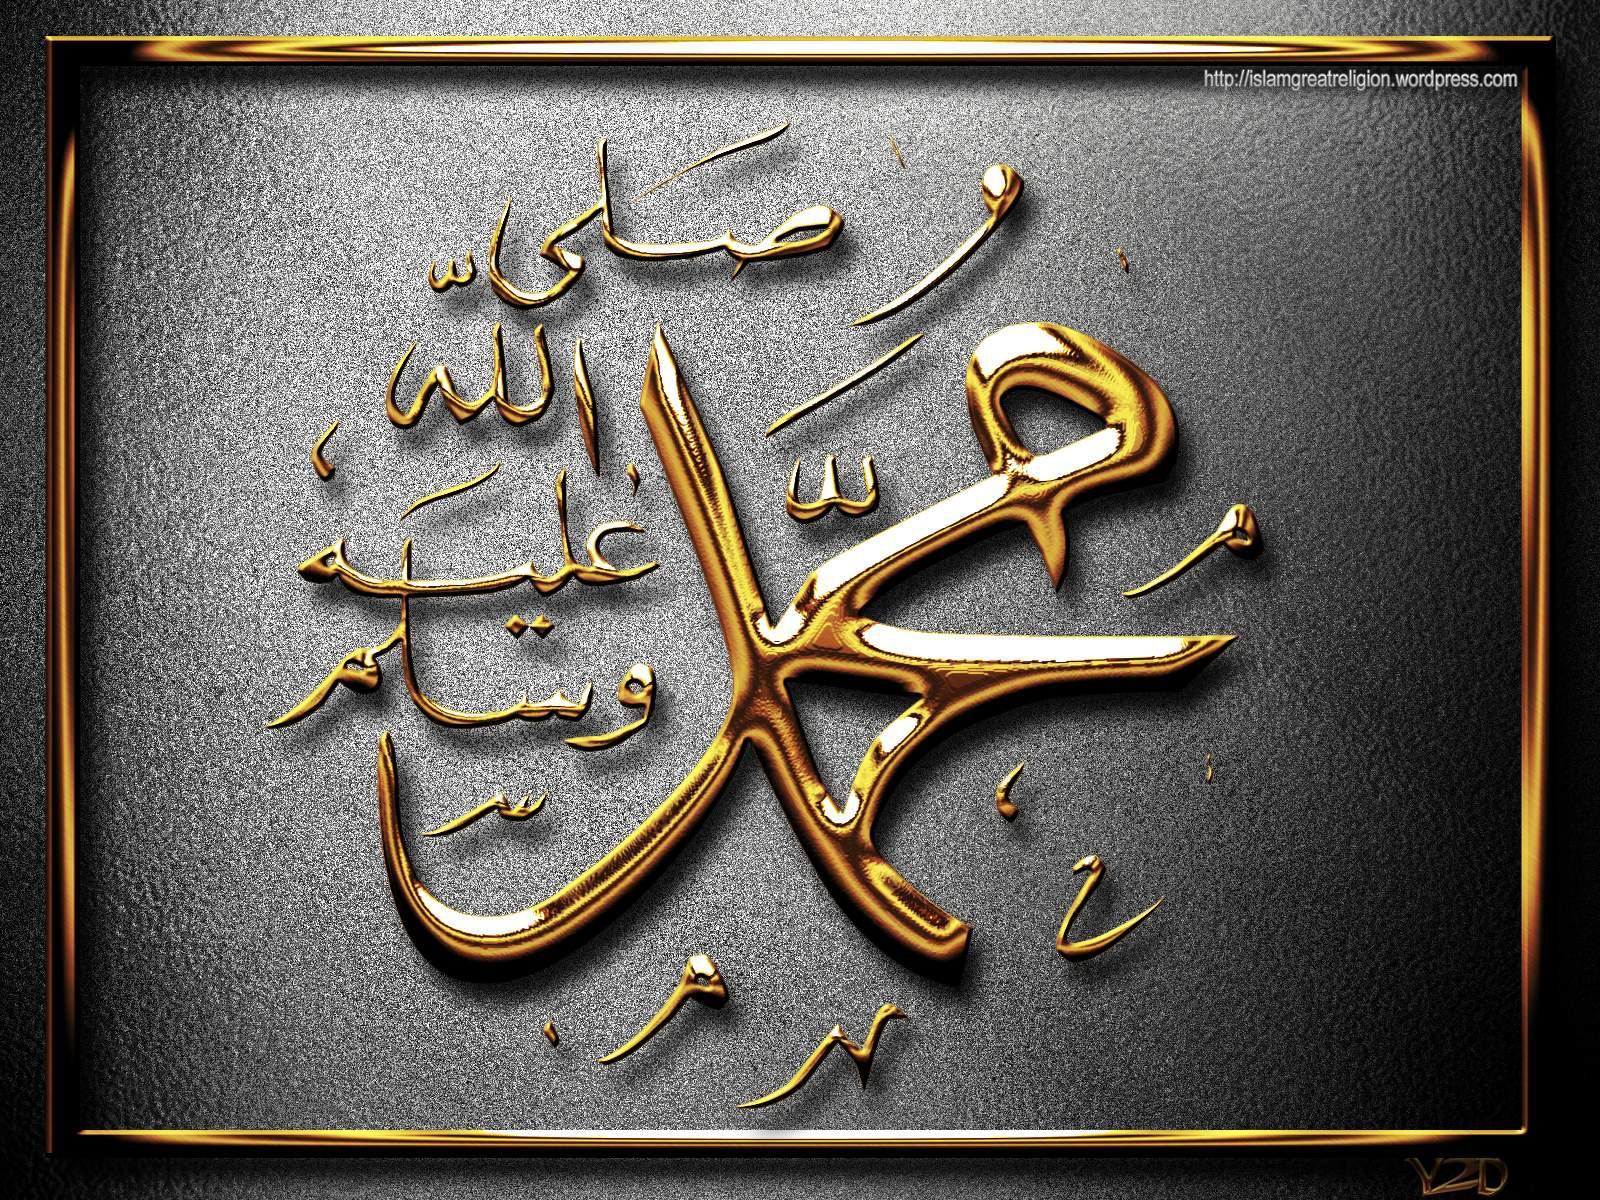 http://3.bp.blogspot.com/-UW38p1Toj7Q/TZtetVyuShI/AAAAAAAABKQ/3Bx8NcClZiU/s1600/Muhammad+pbuh+wallpapers+by+cool+images.JPG